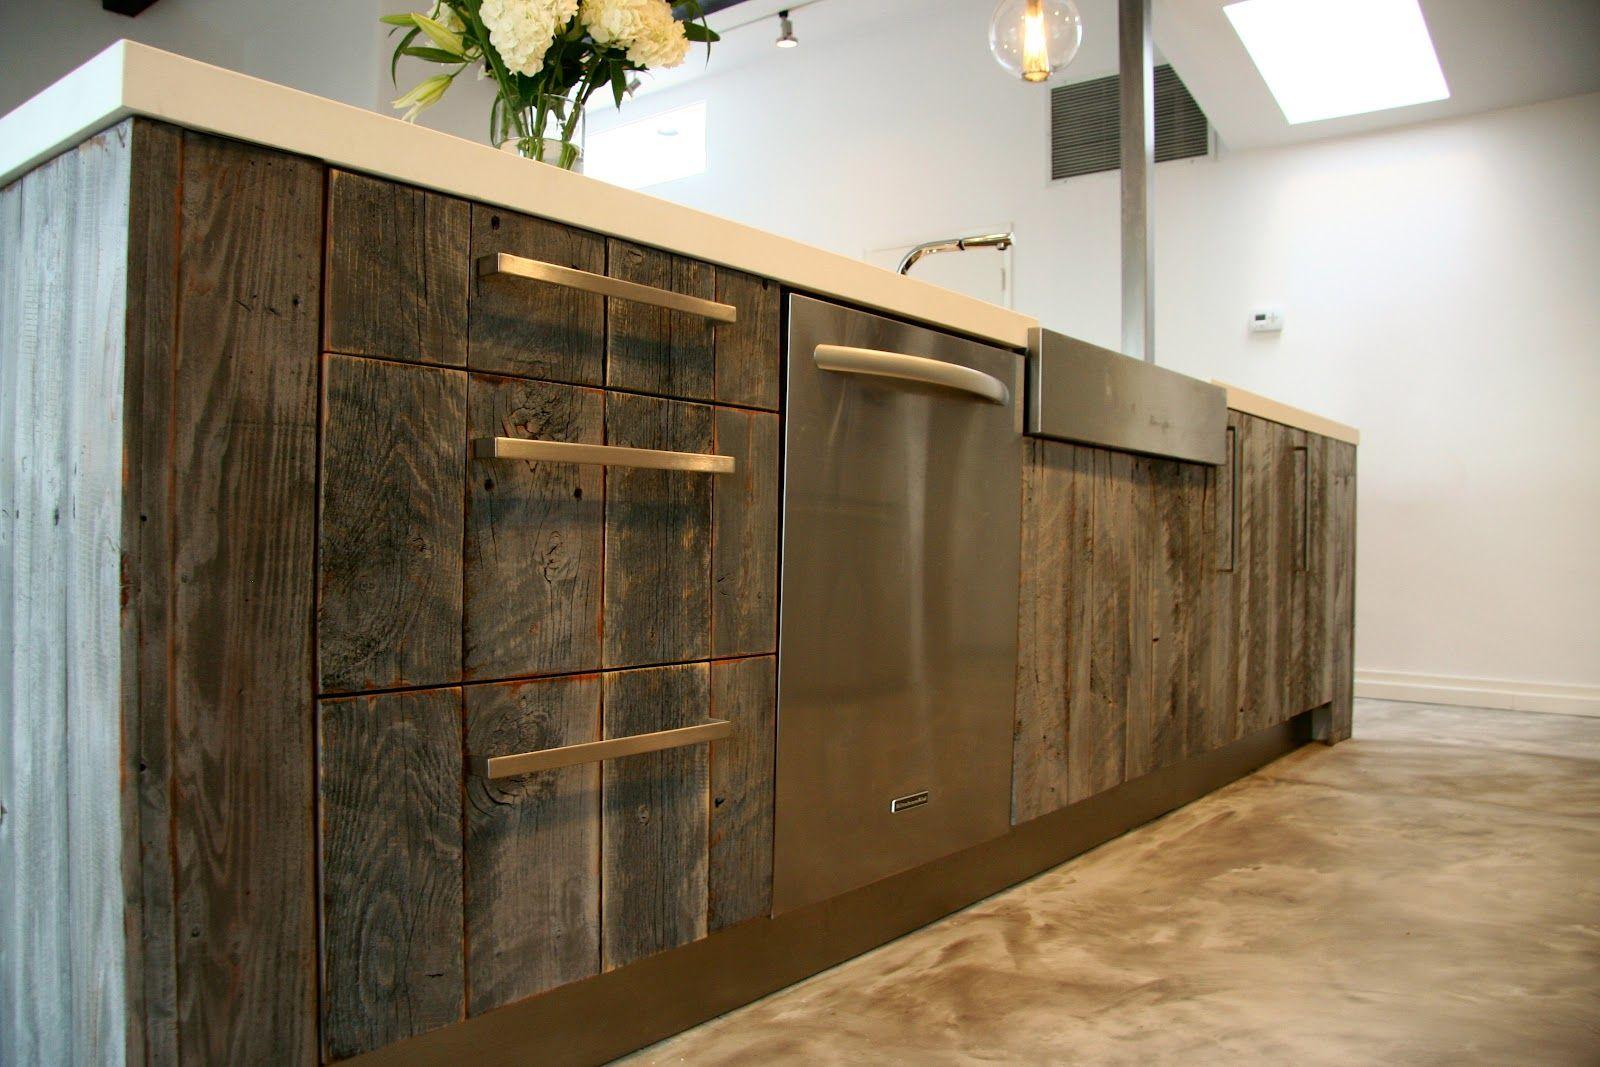 Semihandmade Reclaimed Lumber Kitchen Reclaimed Wood Kitchen Wood Kitchen Cabinets Reclaimed Kitchen Cabinets